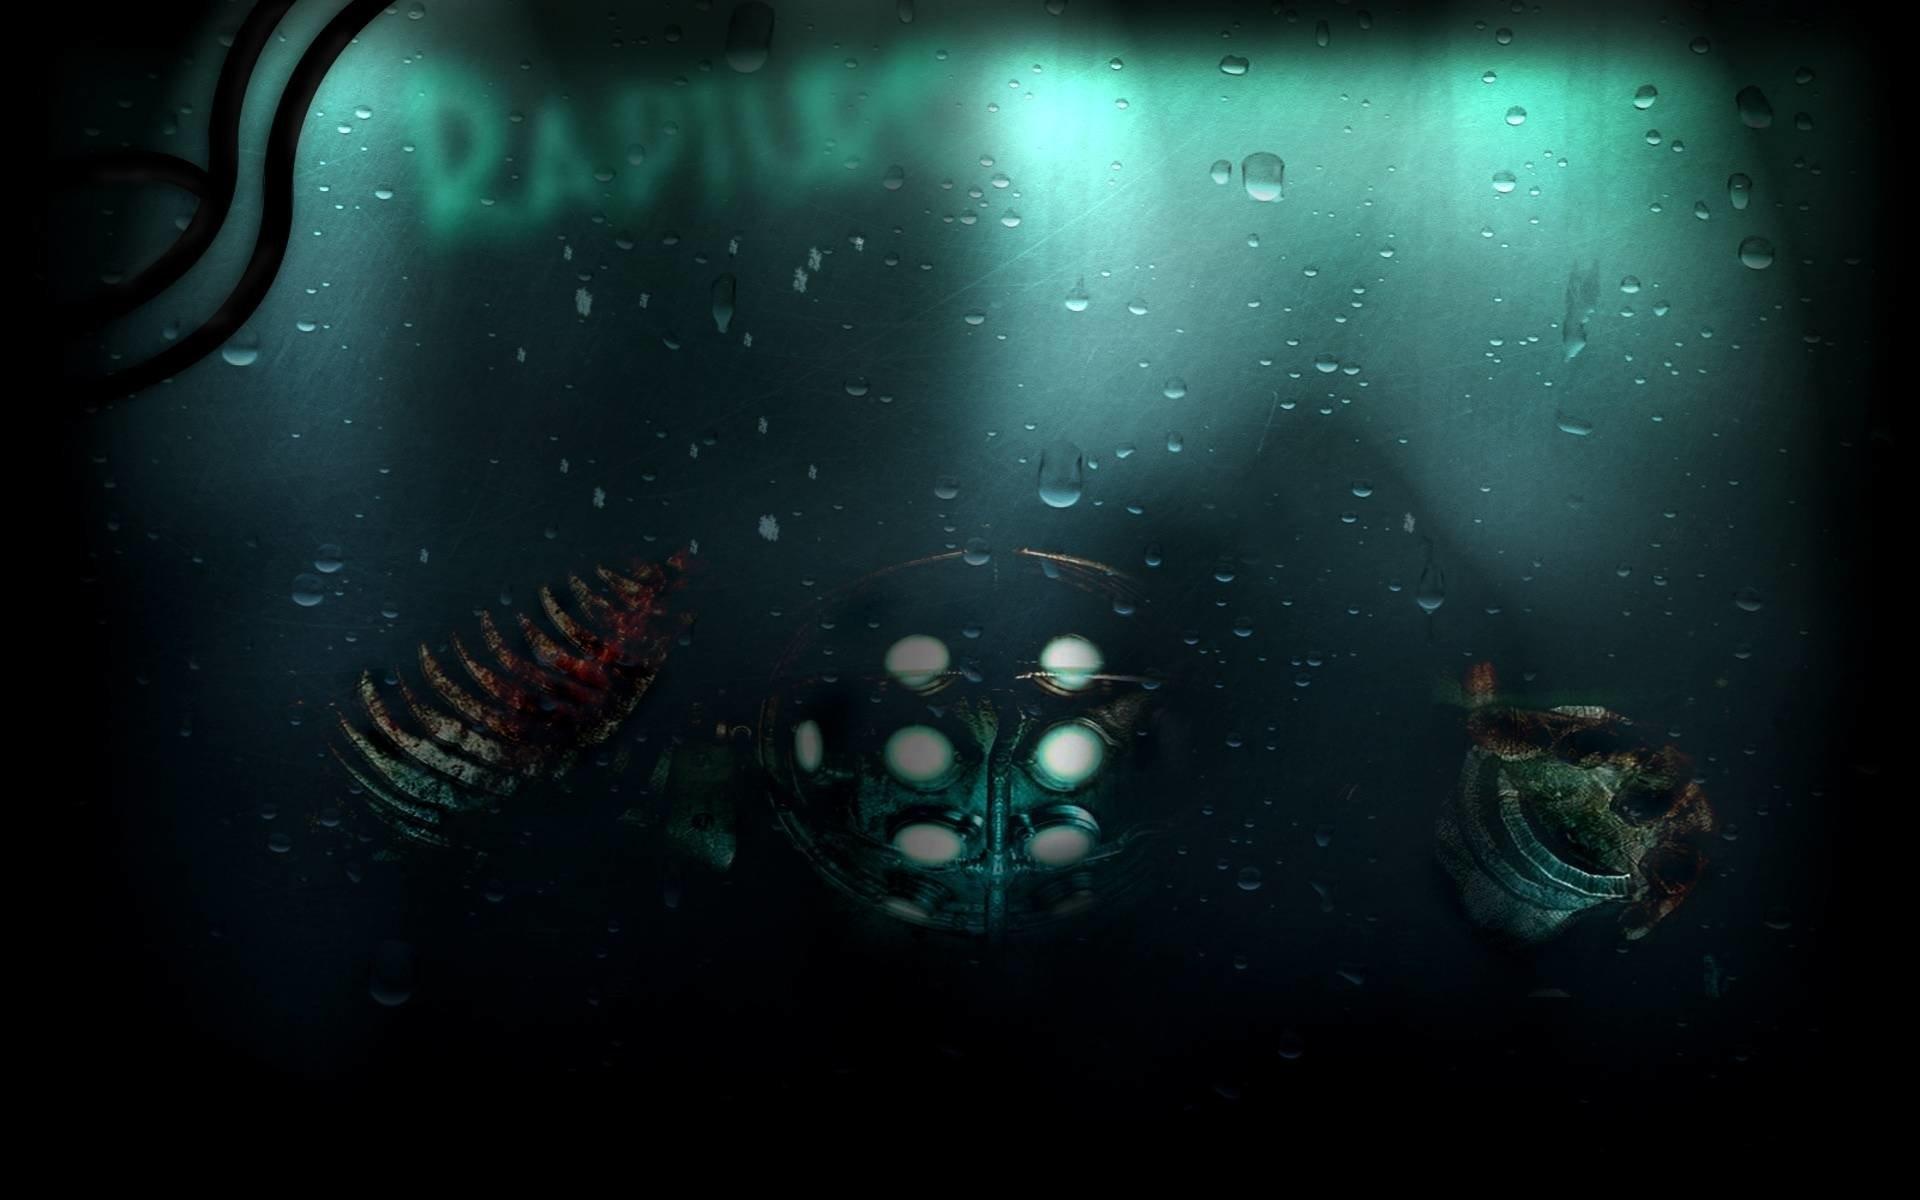 Bioshock Rapture wallpaper x WallpaperUP